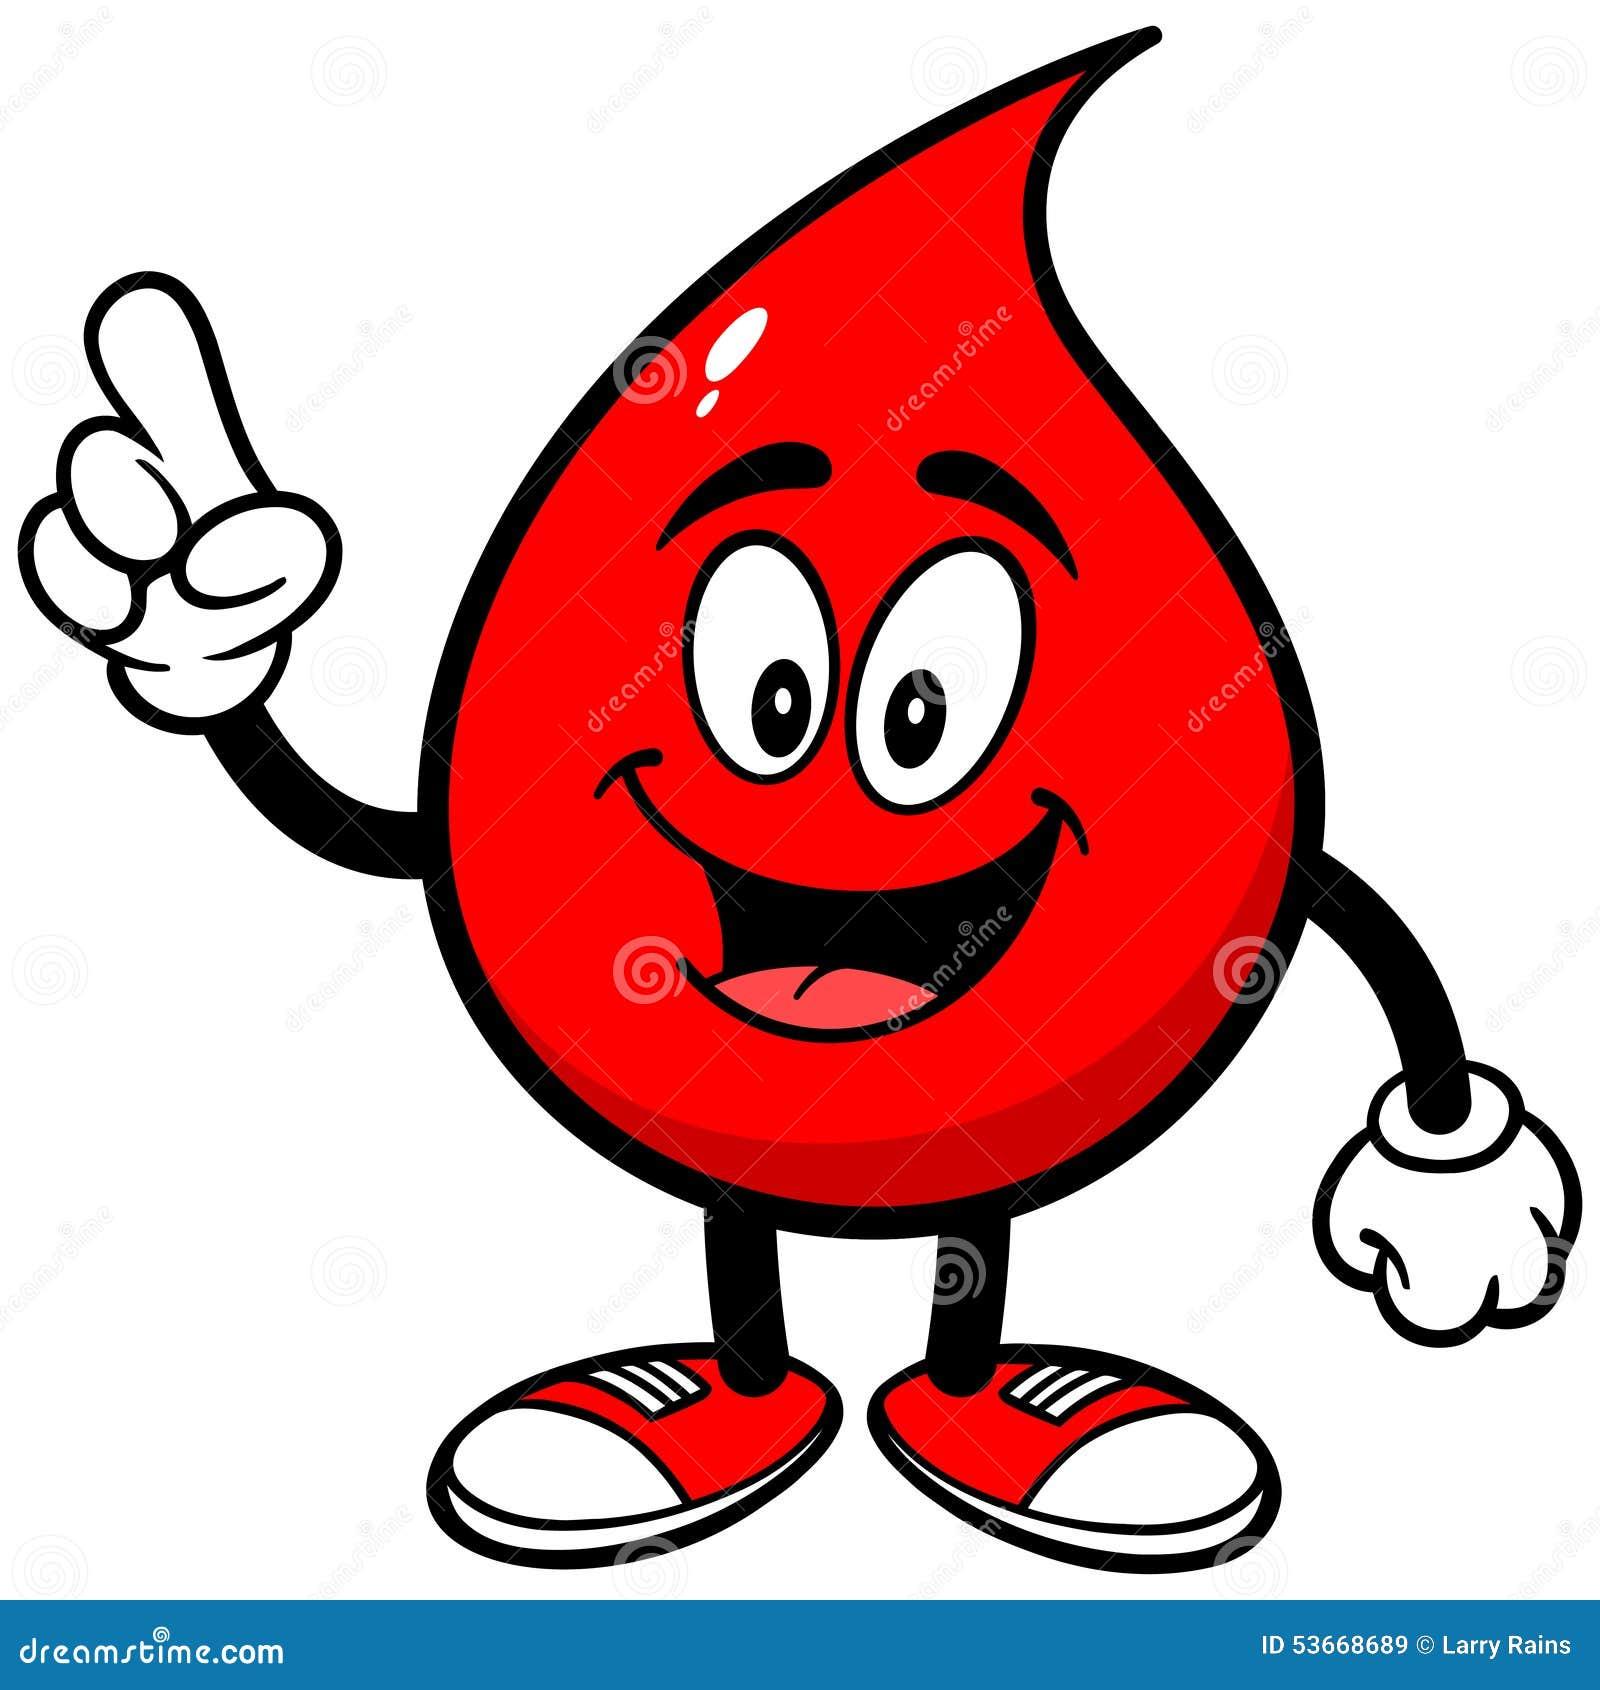 Blood Drop Talking Stock Vector - Image: 53668689